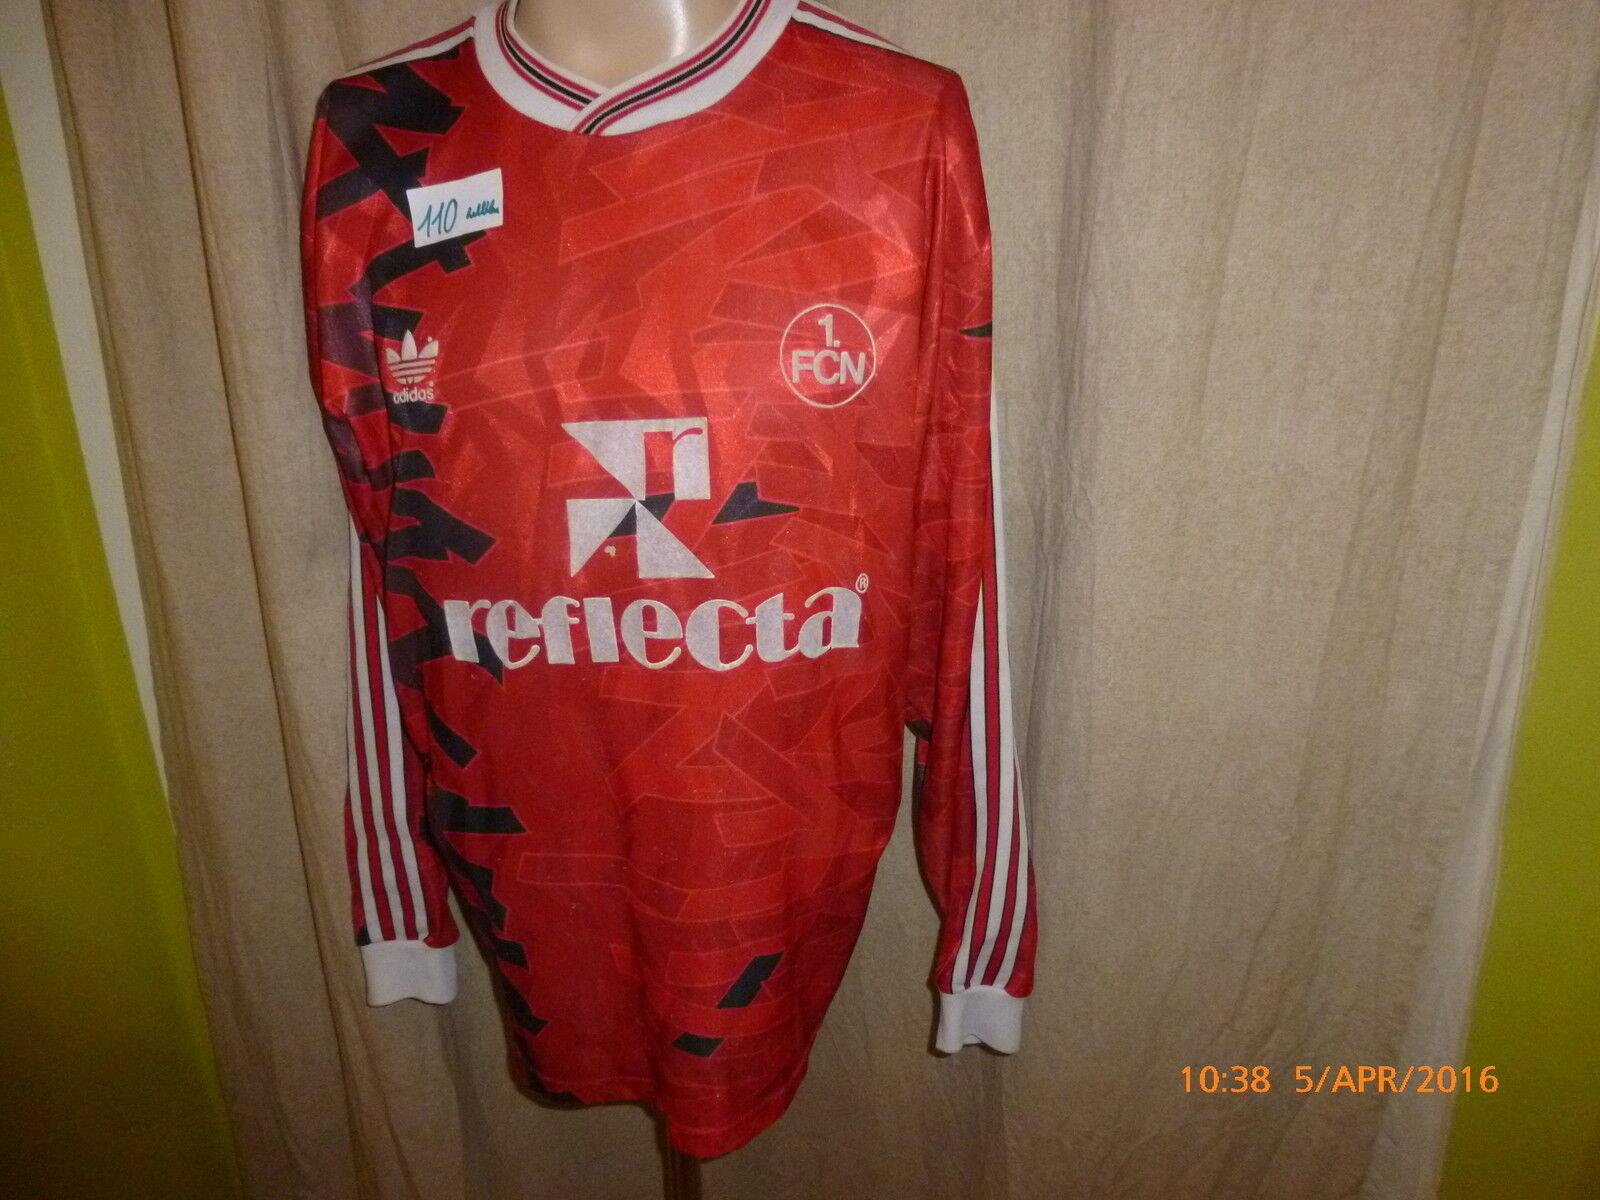 1.FC Nürnberg Adidas Langarm Trikot 1992 93  reflecta rund ums  + Signiert Gr.L  | Feine Verarbeitung